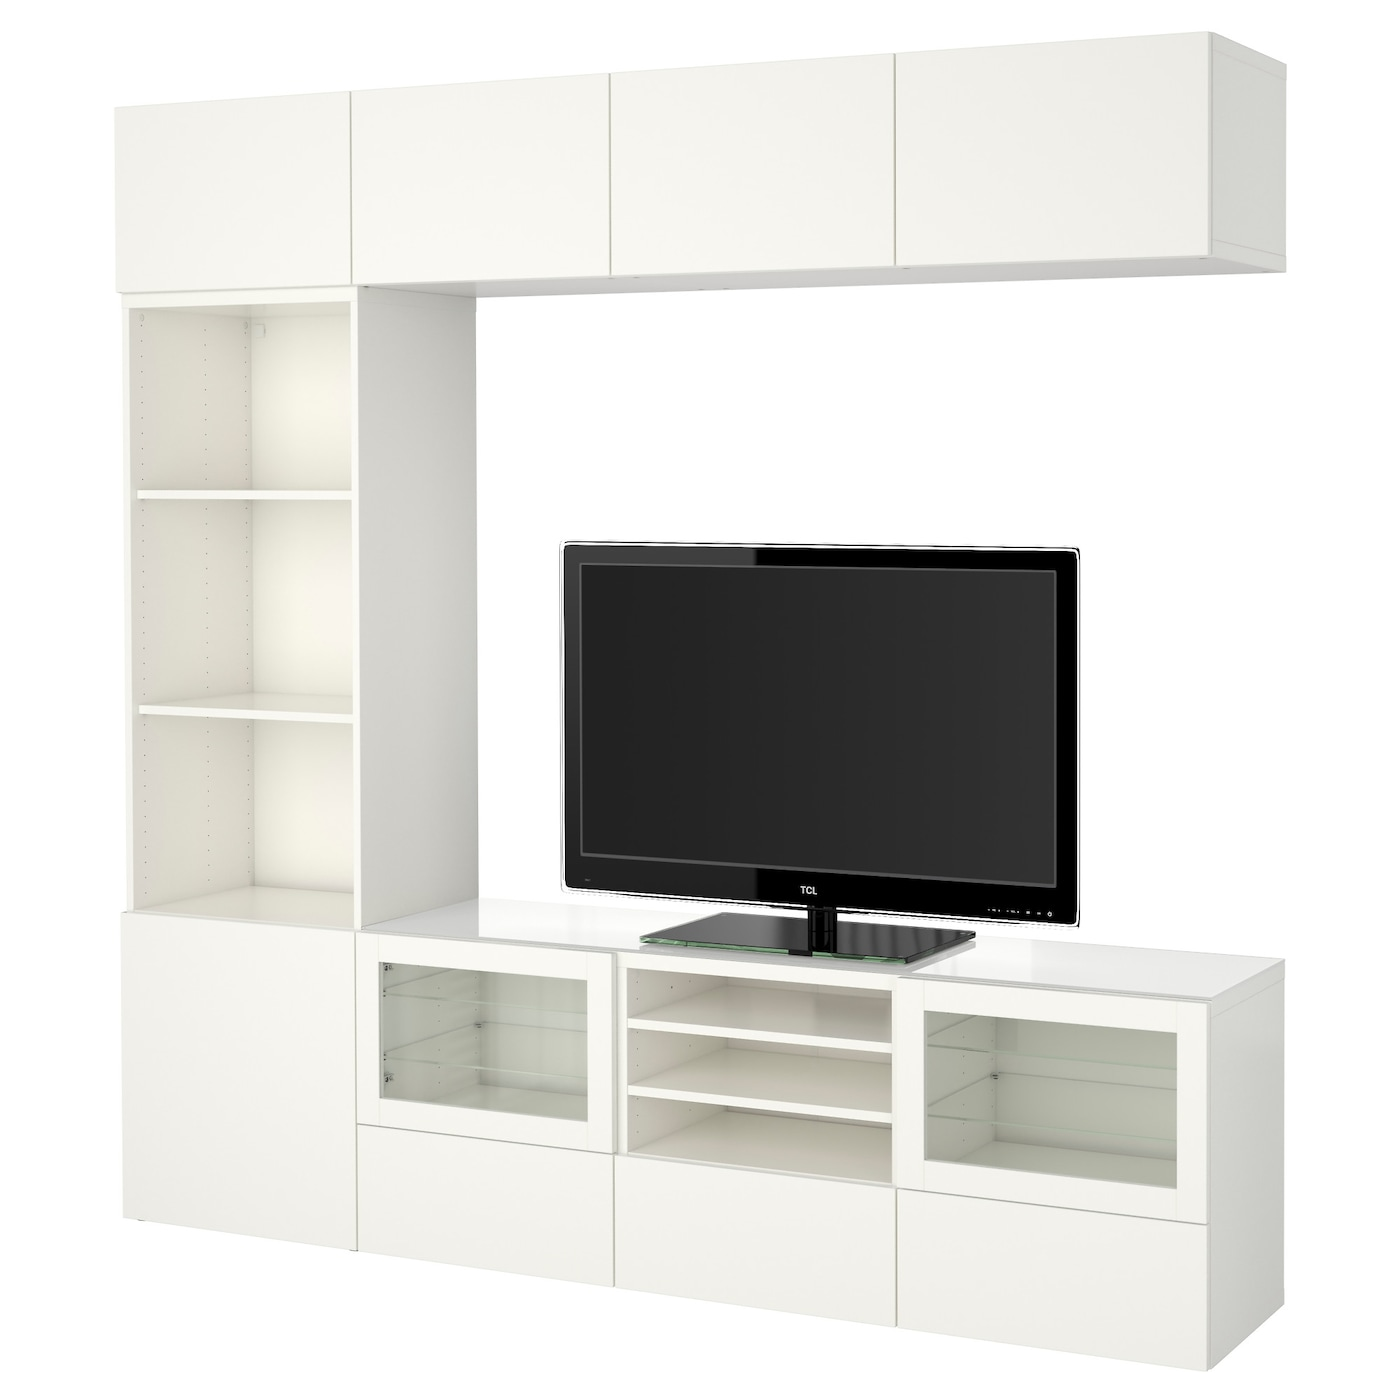 best tv storage combination glass doors lappviken sindvik white clear glass 240 x 40 x 230 cm. Black Bedroom Furniture Sets. Home Design Ideas